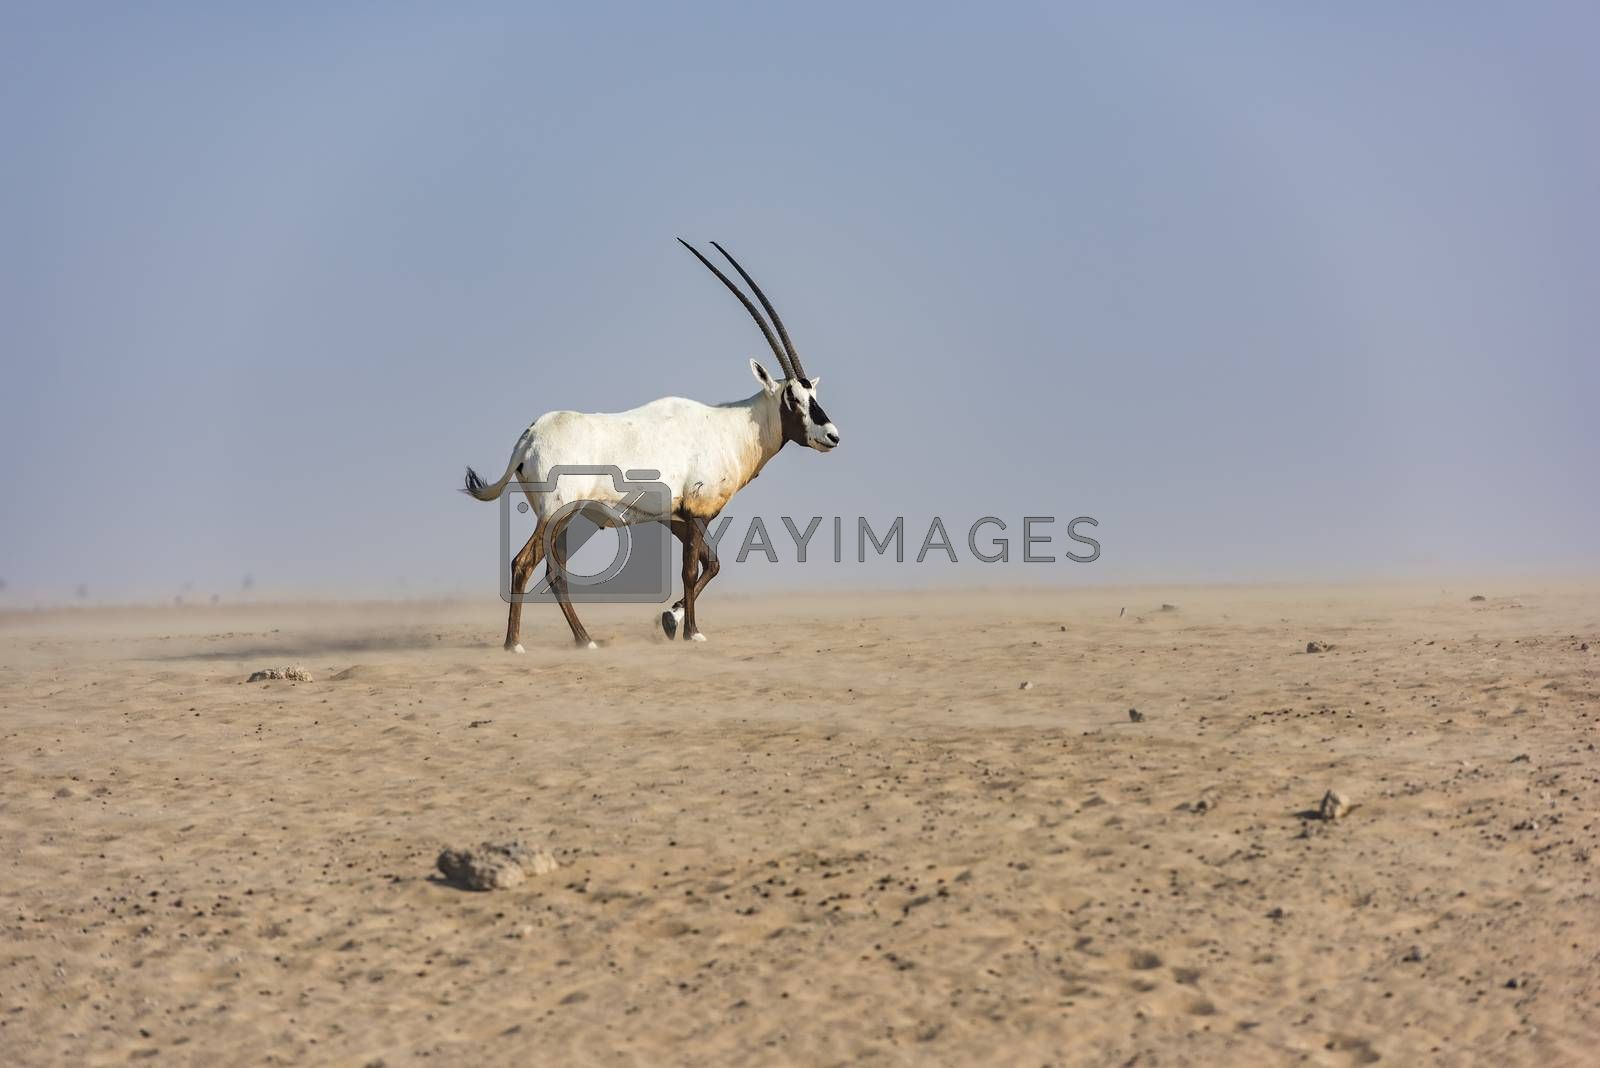 Royalty free image of An Arabian oryx in Dubai Desert, United Arab Emirates by GABIS